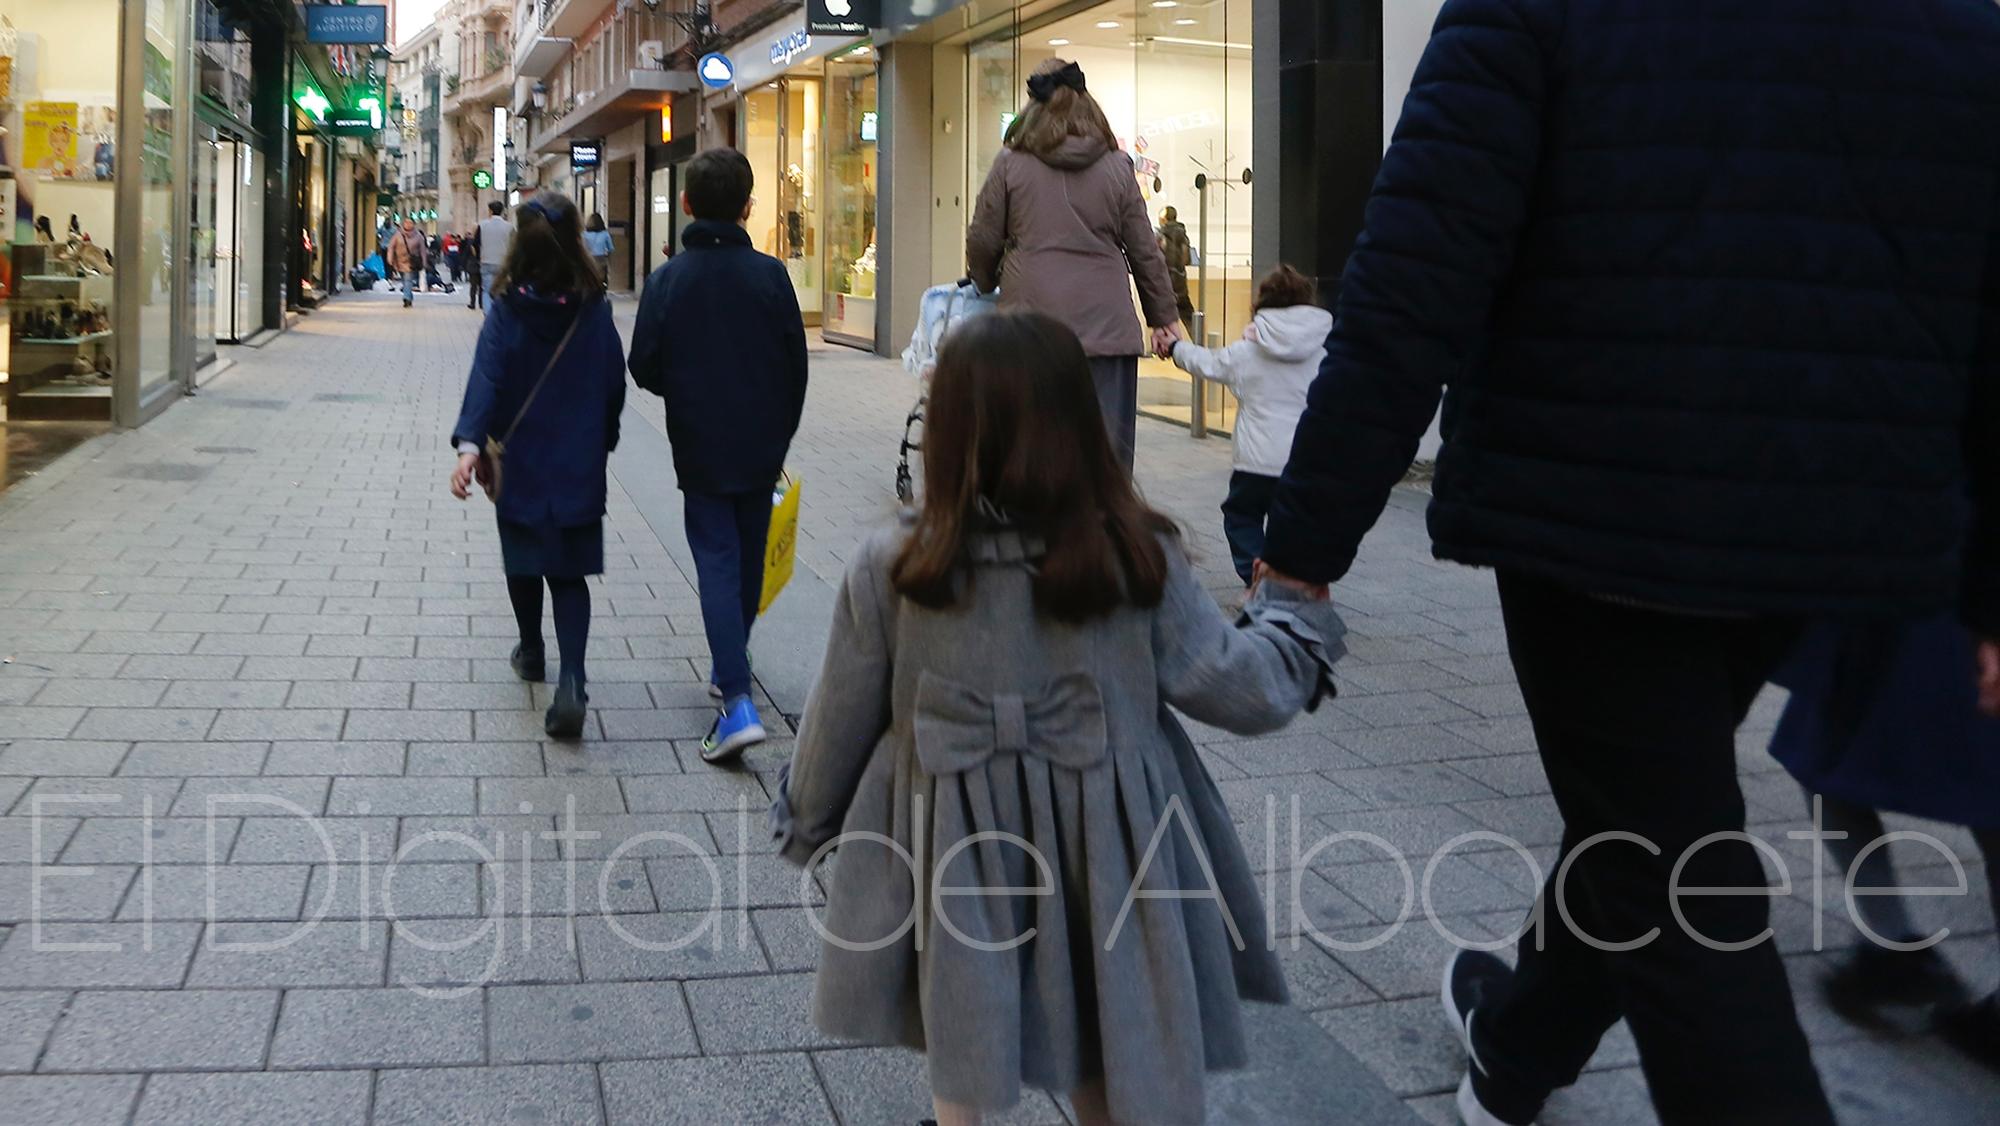 noticias niños calle coronavirus albacete